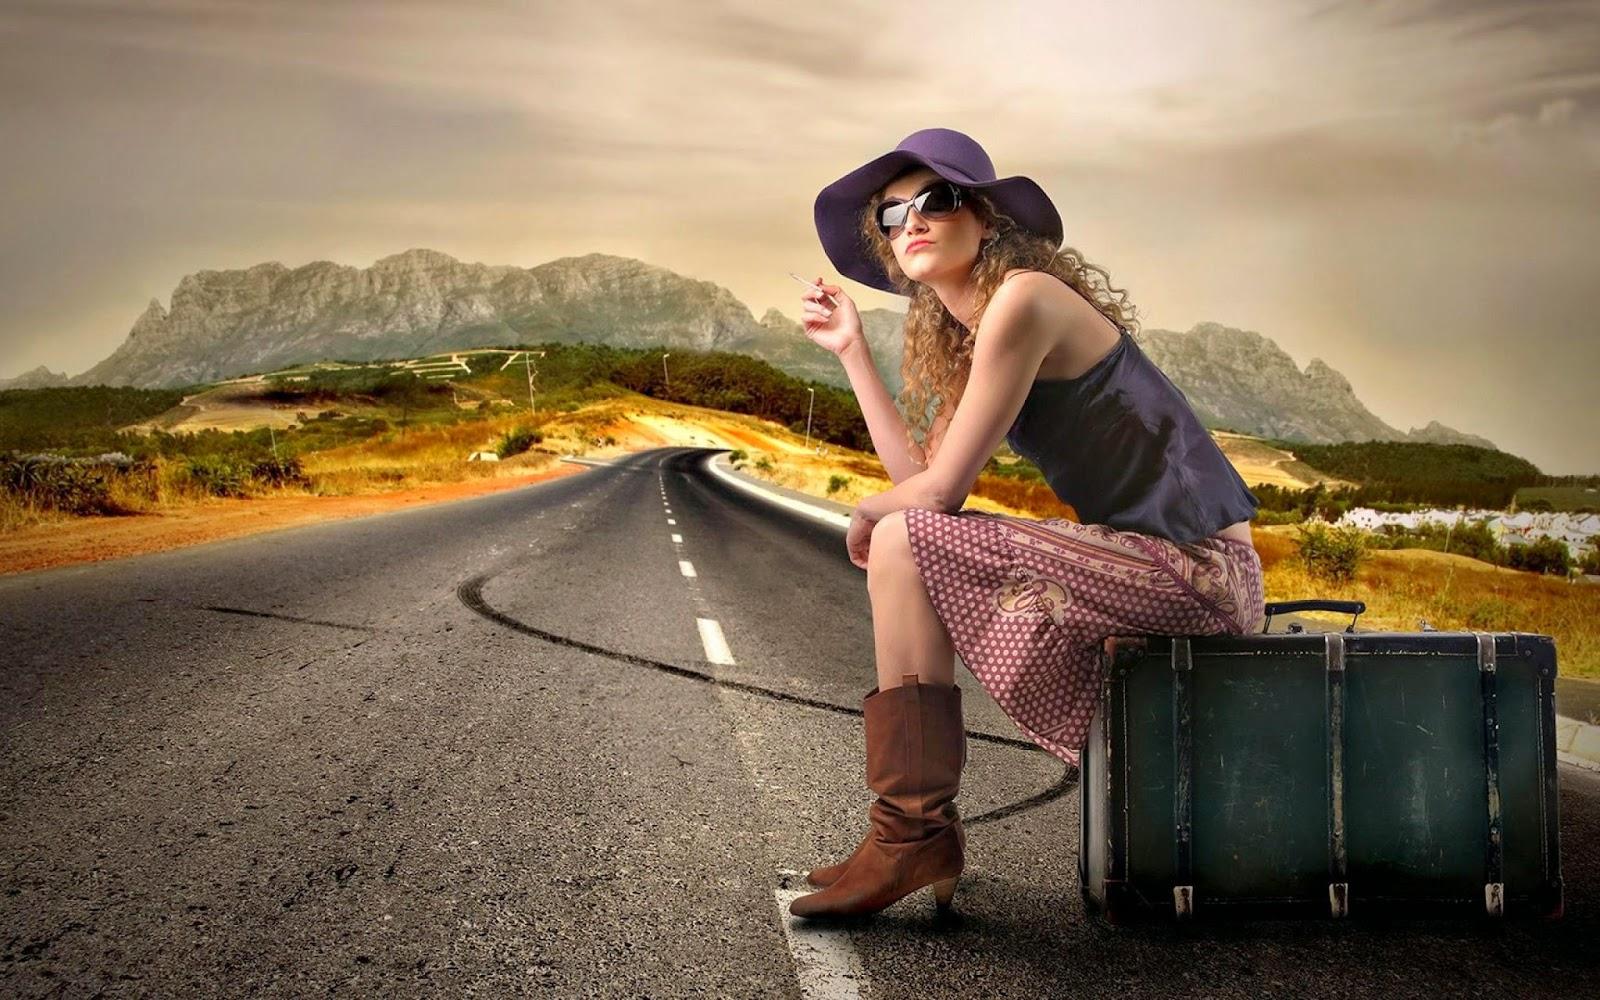 Beautiful Girl On The Road HD Wallpaper